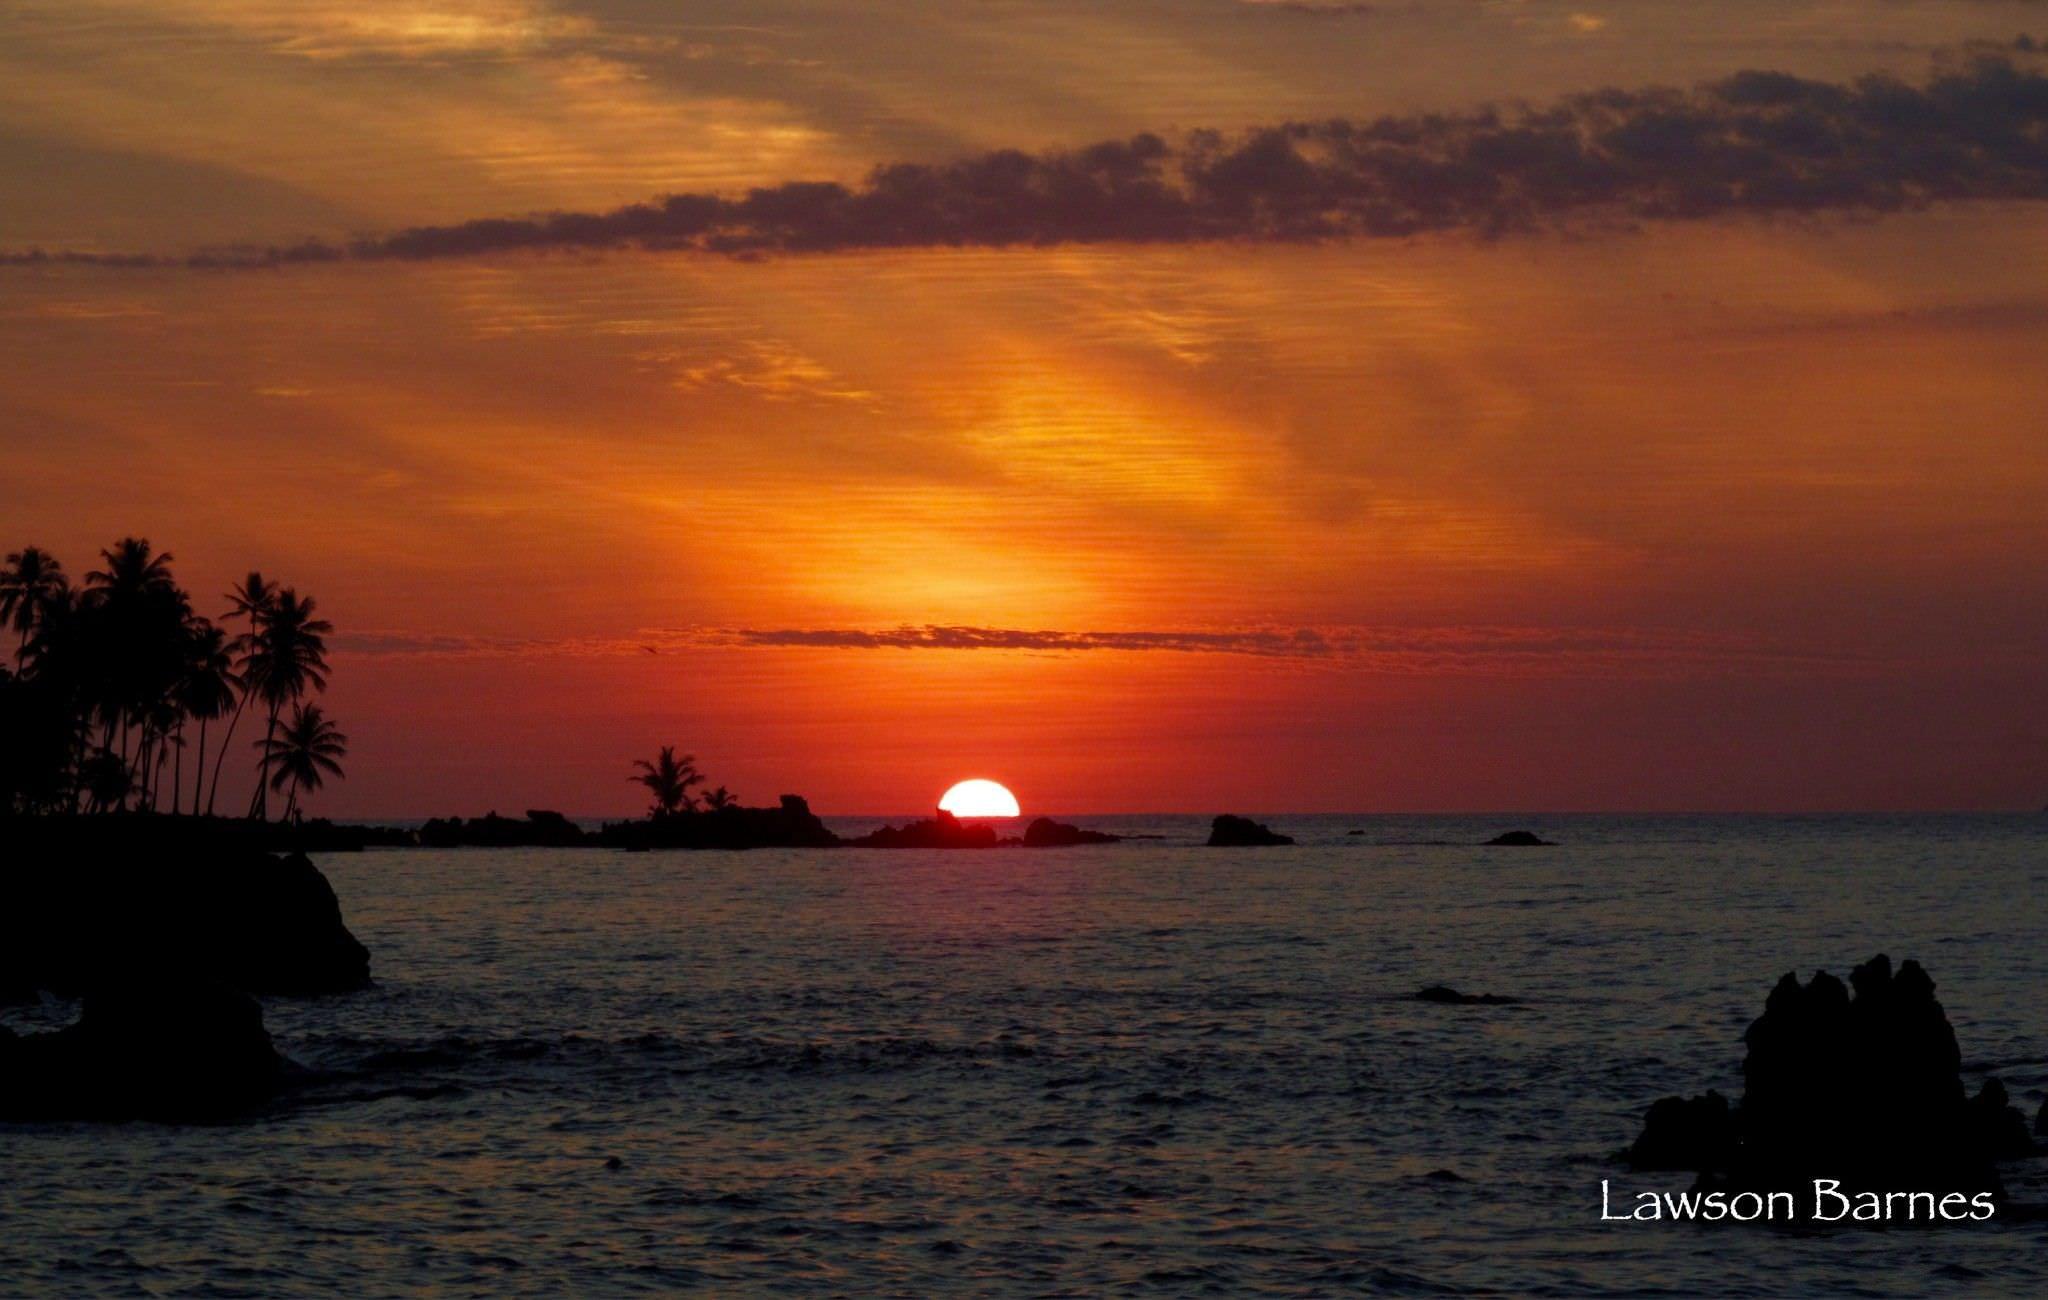 Sunset corcovado costa rica beach paradise